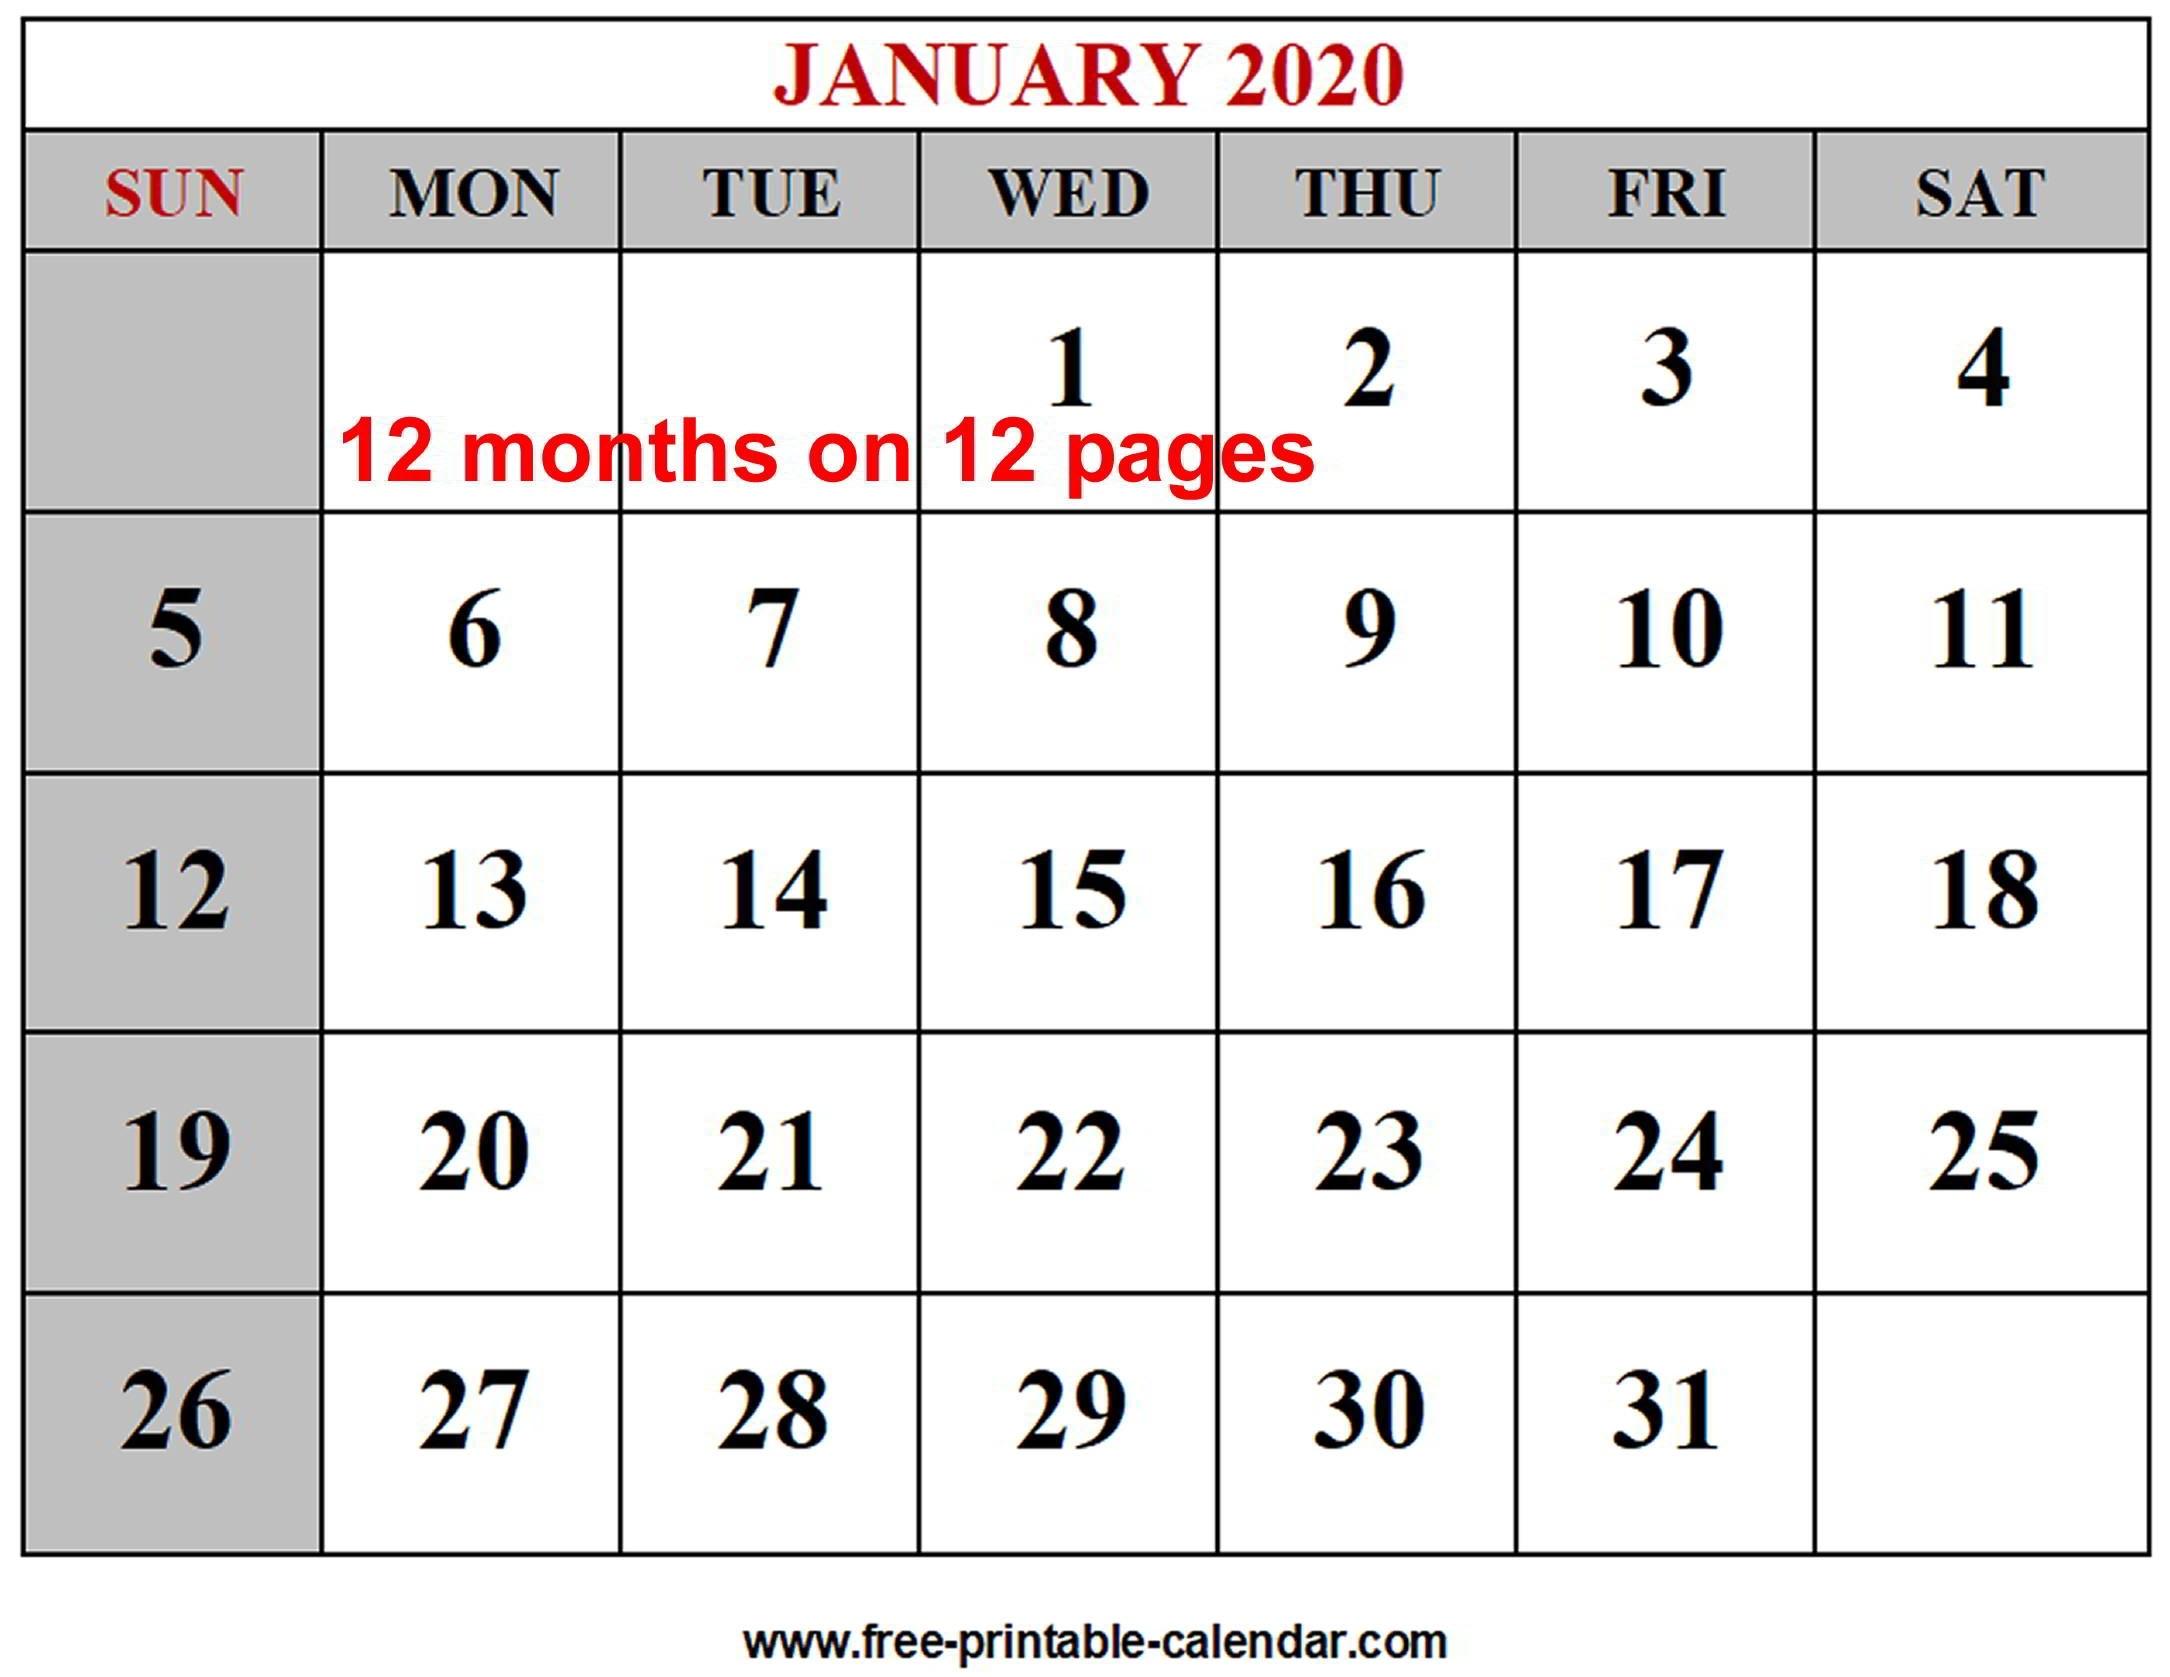 Year 2020 Calendar Templates - Free-Printable-Calendar Incredible Free 2 Page Monthly Calendar Templates 2020